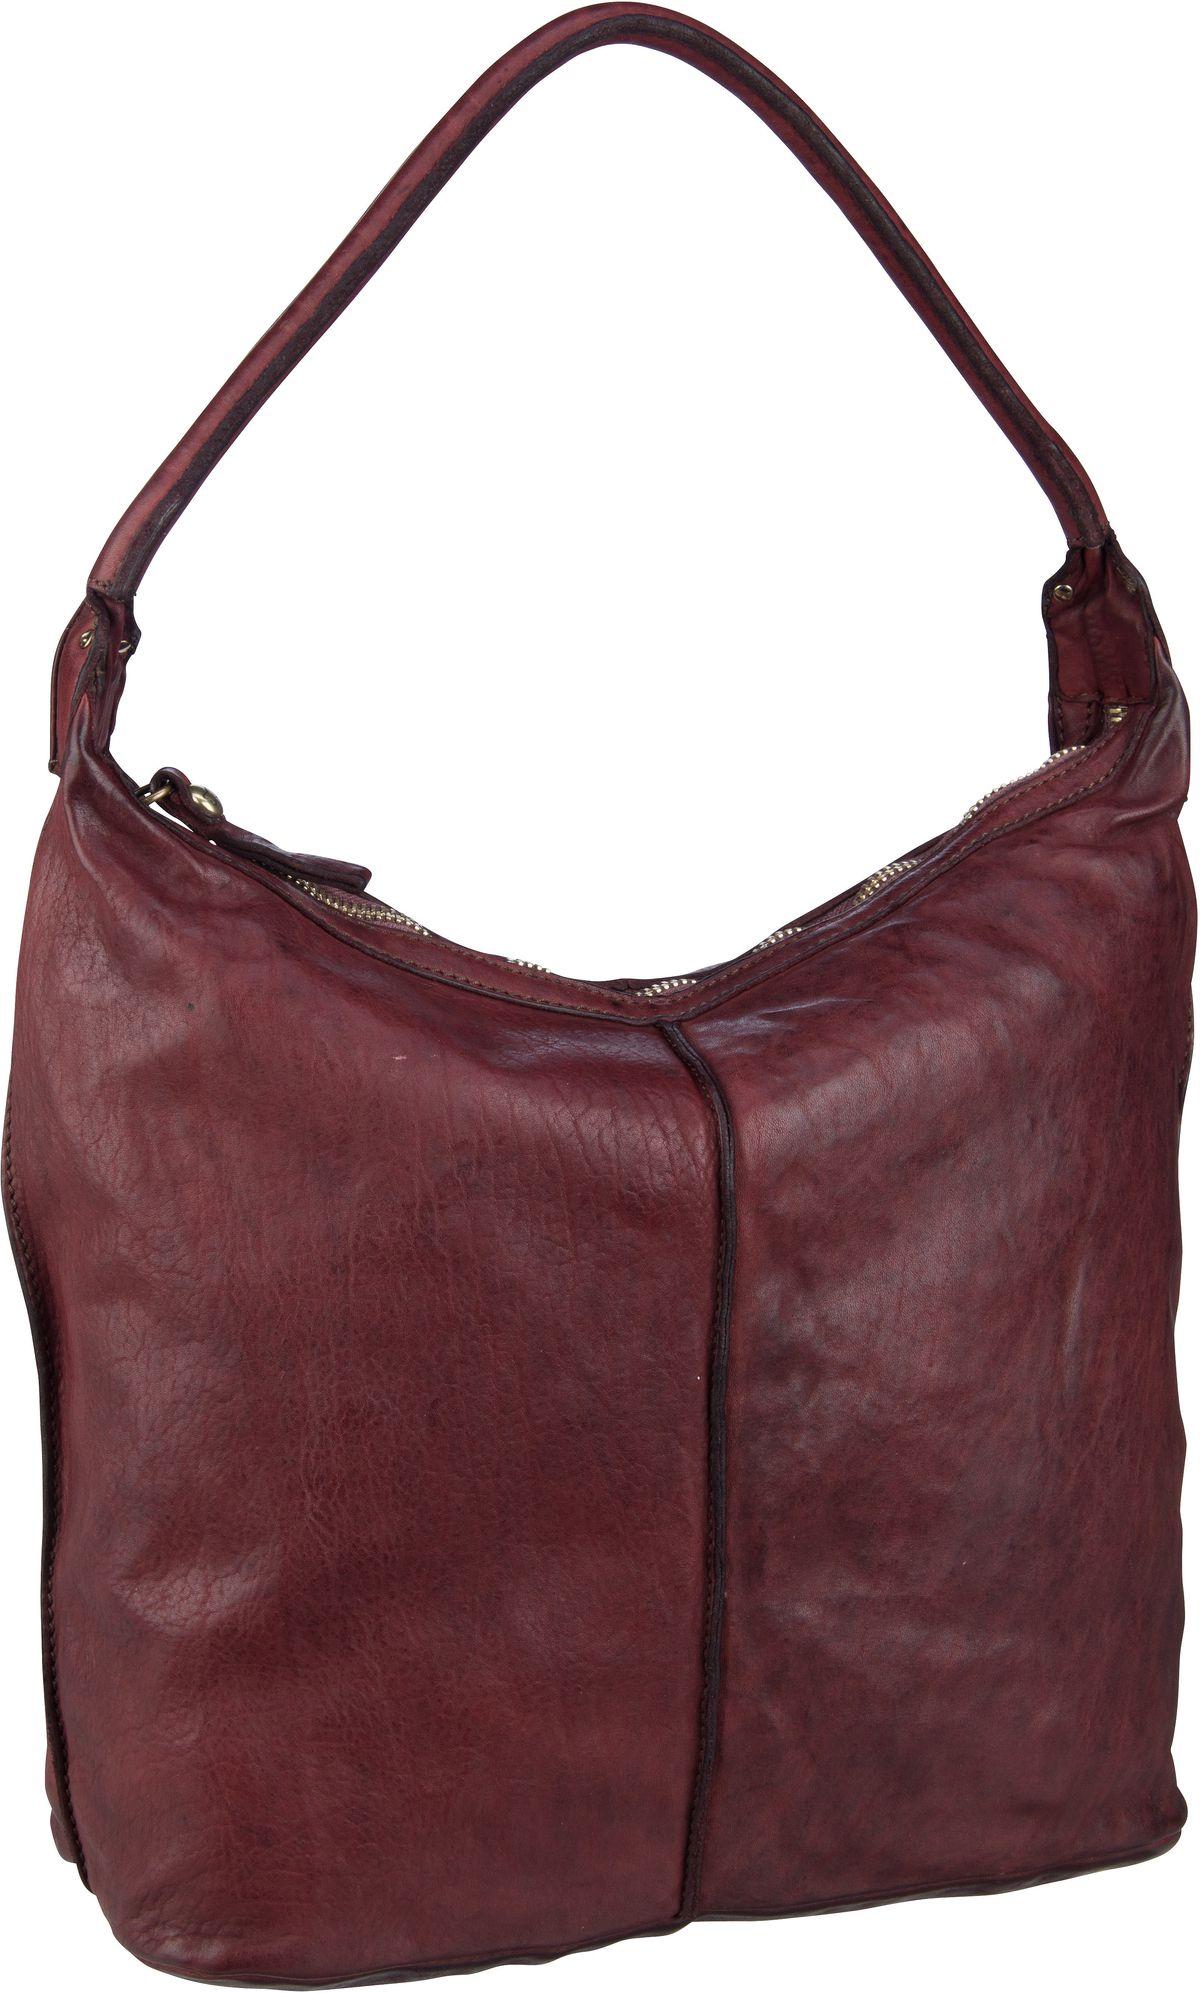 Handtasche Asteria C16370 Vinaccia